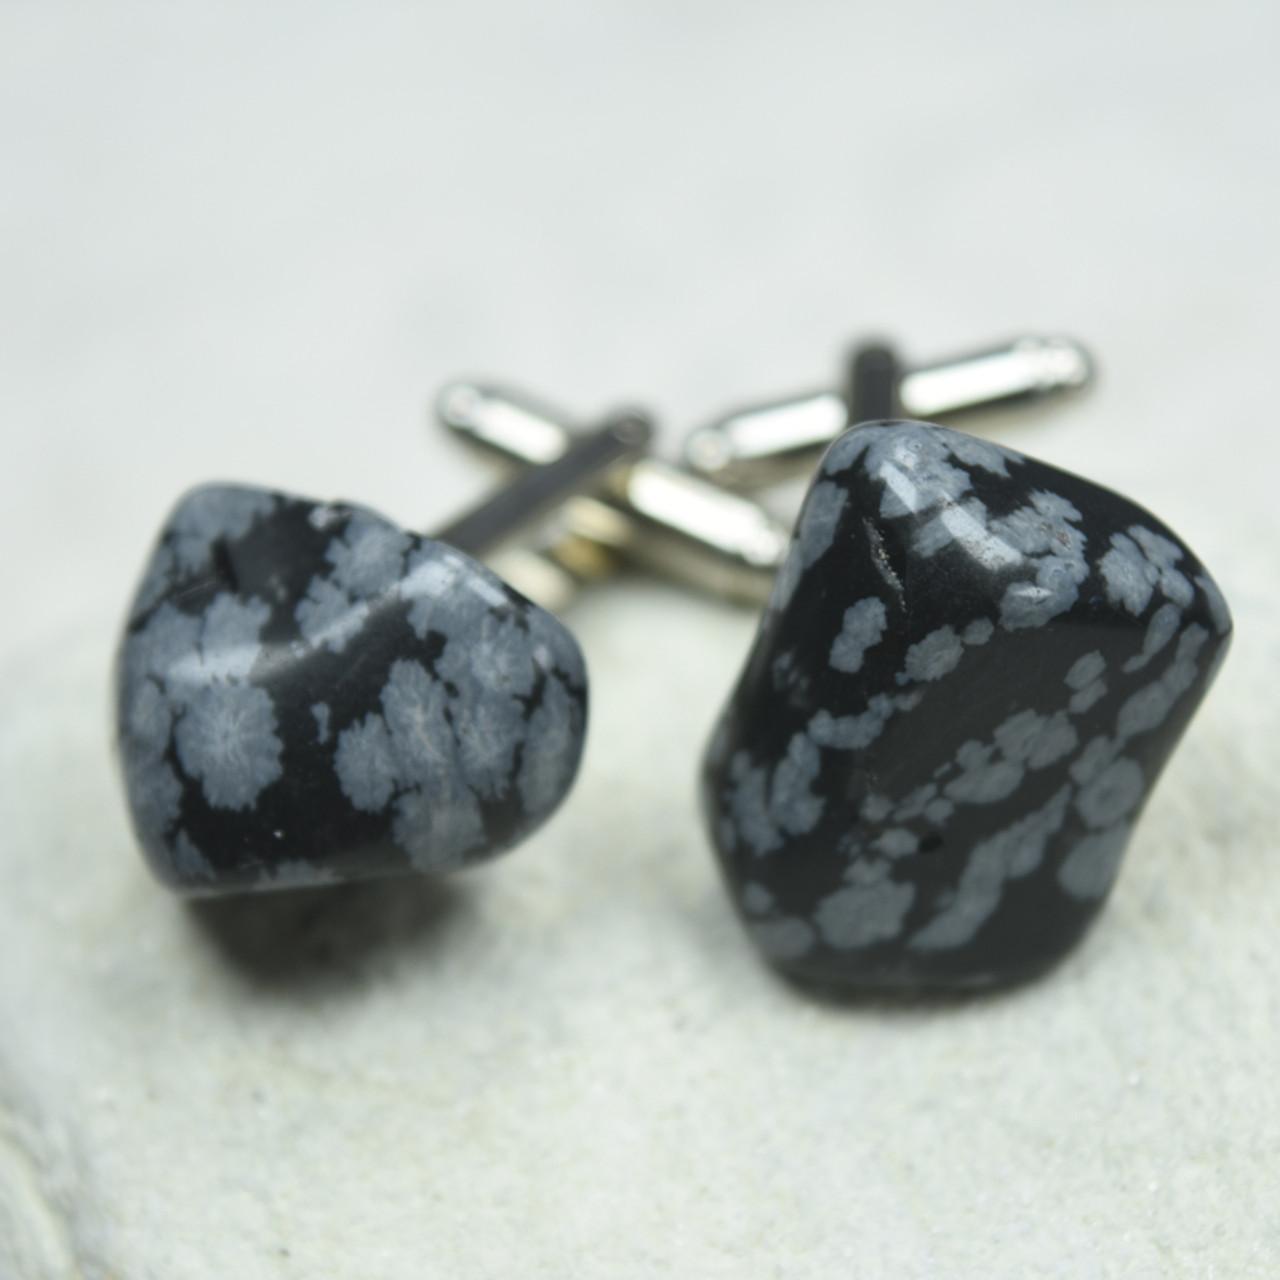 Snowflake Obsidian Cufflinks